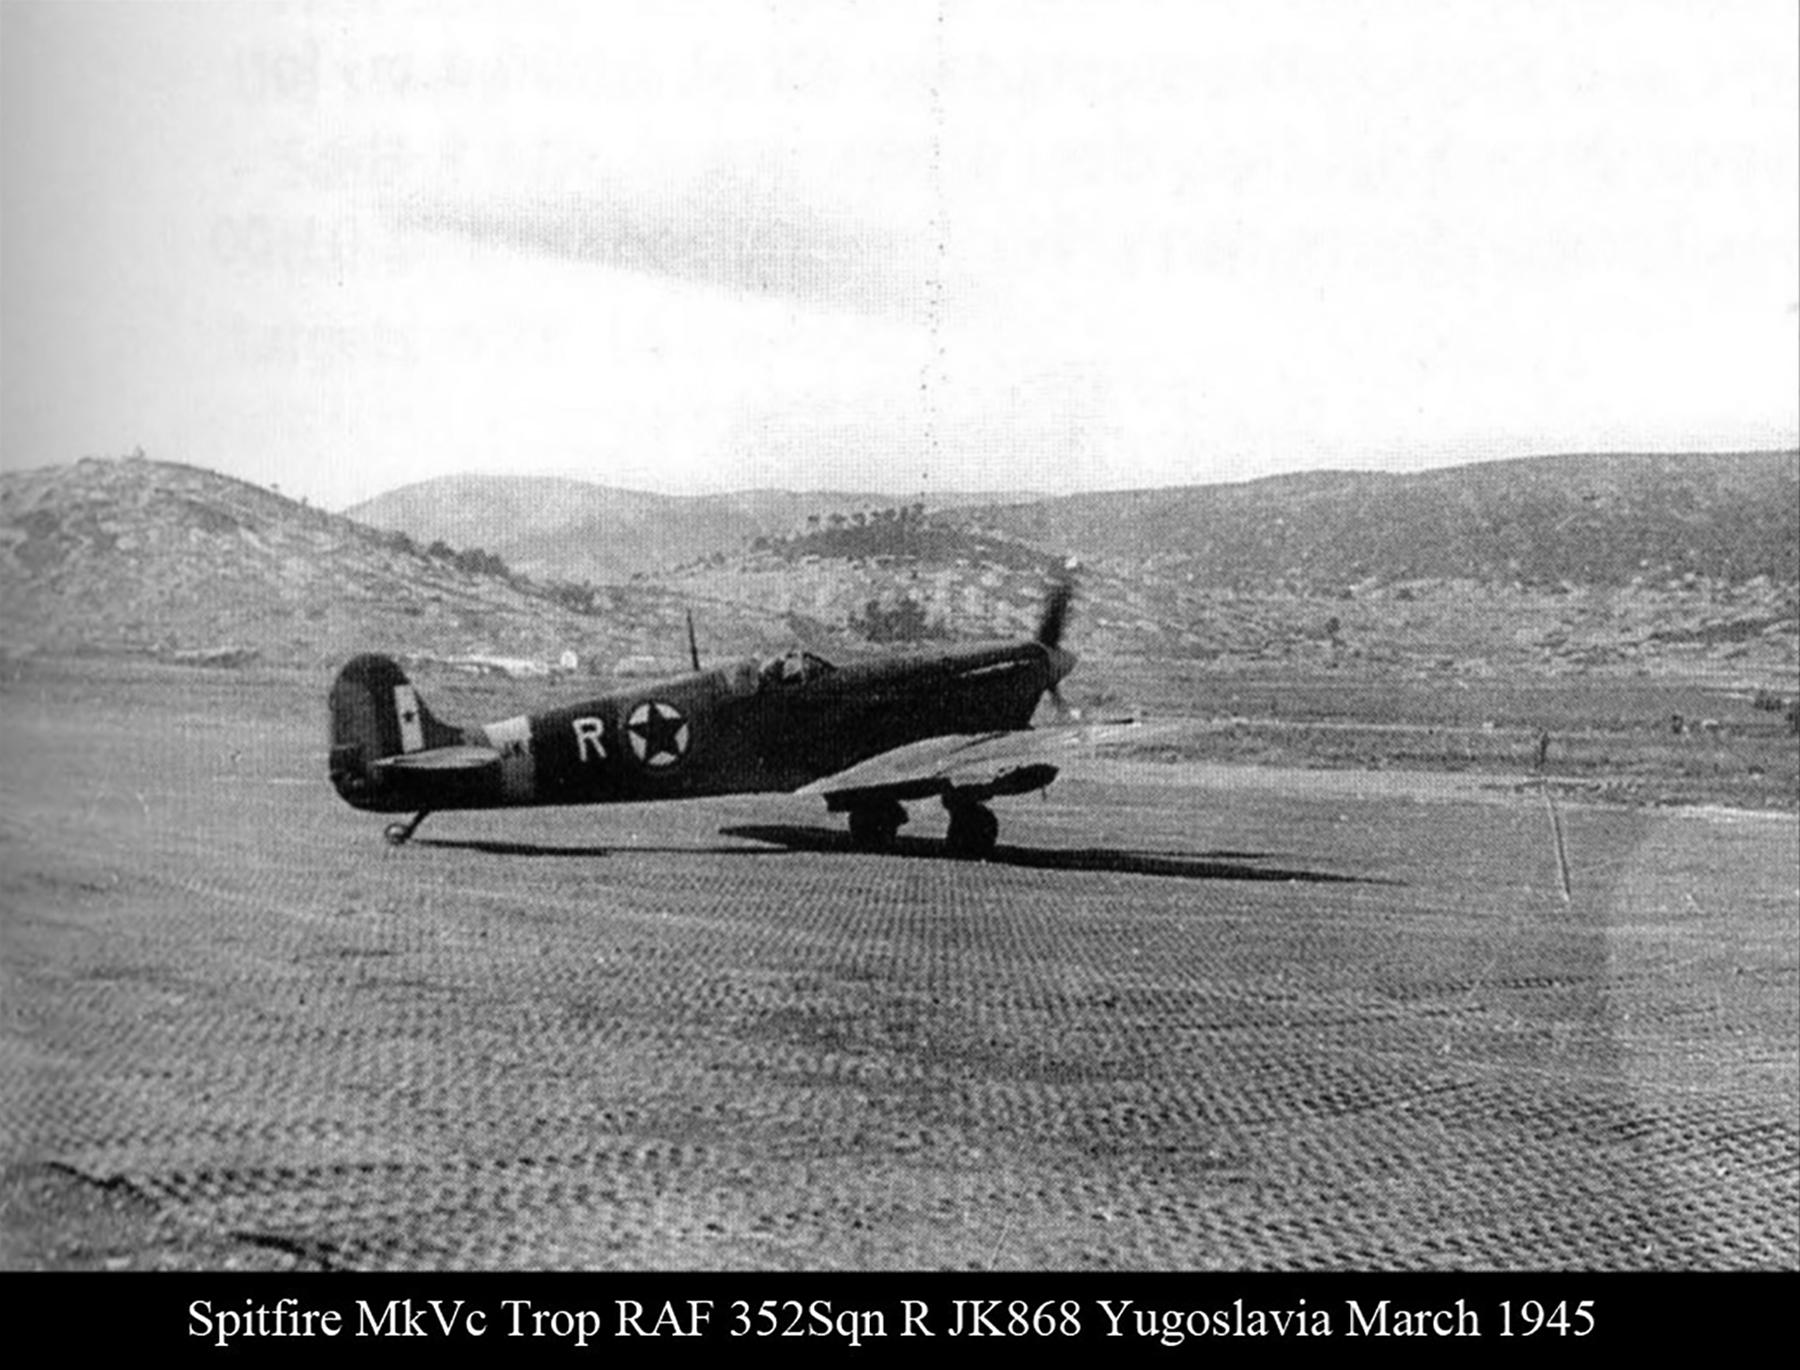 Spitfire MkVcTrop RAF 352Sqn R JK868 Yugoslavia Mar 1945 01